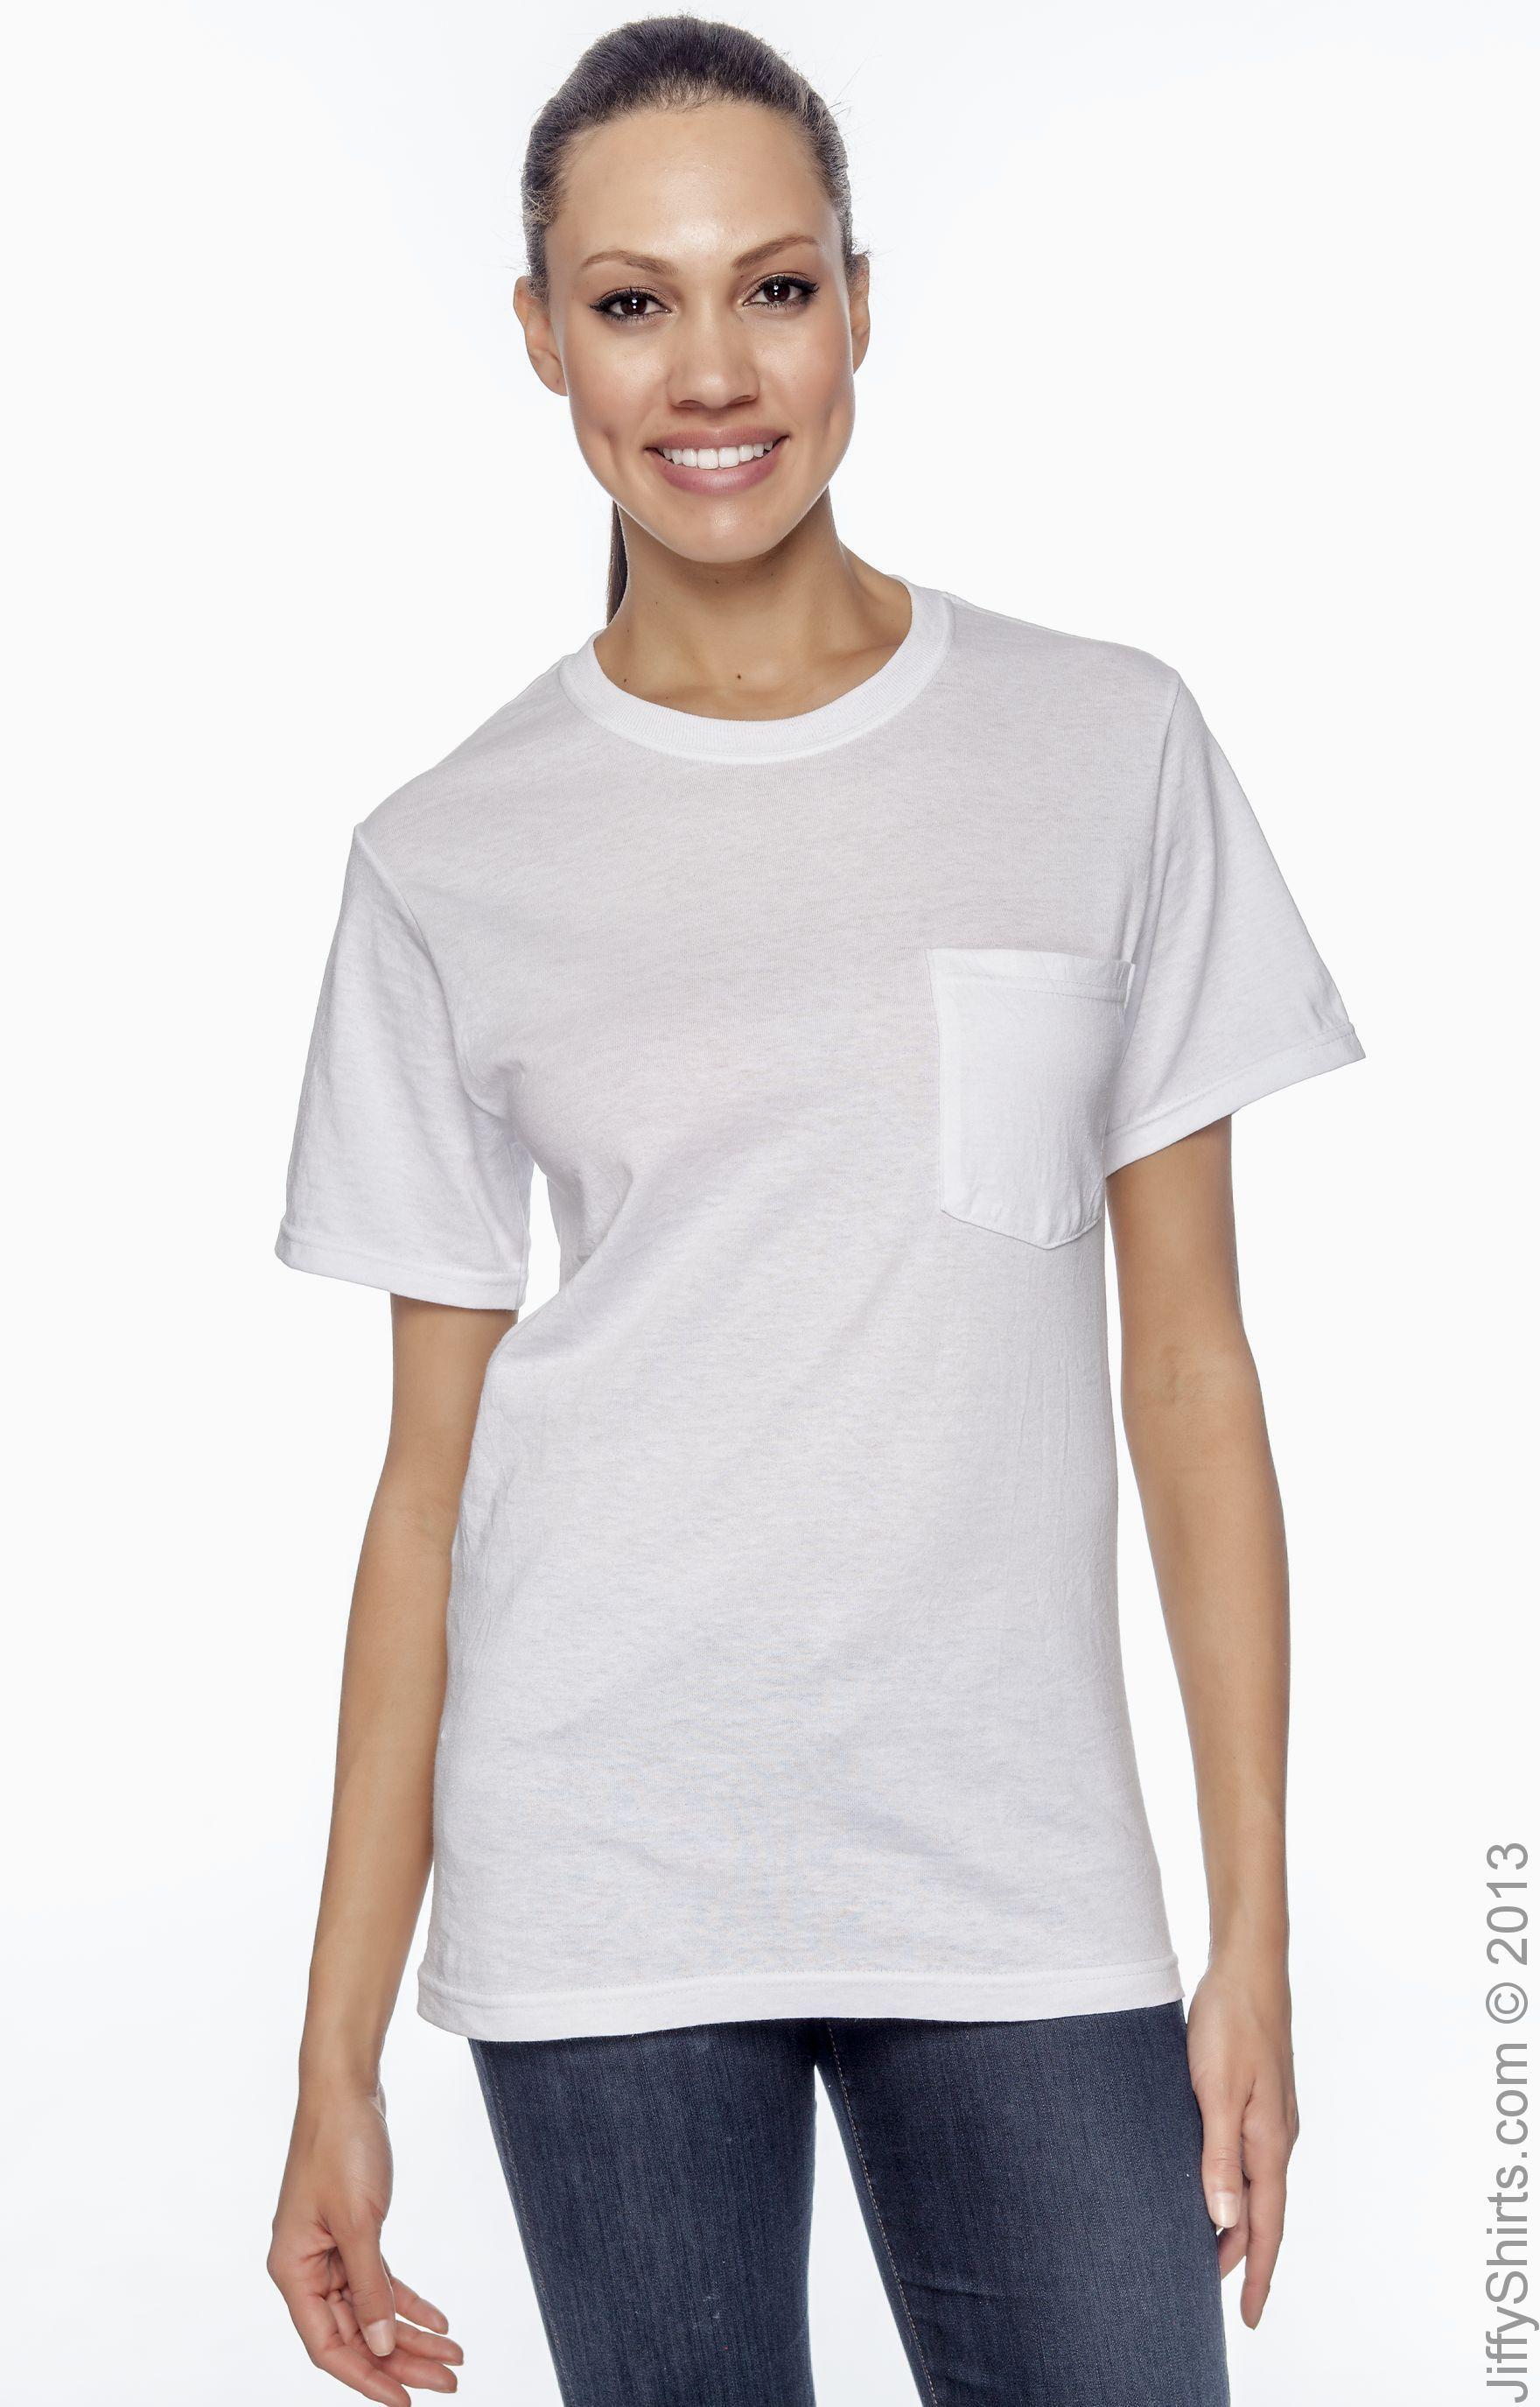 215 Fruit Of The Loom Kids Childrens Plain WHITE T-Shirts Tee Shirts Wholesale